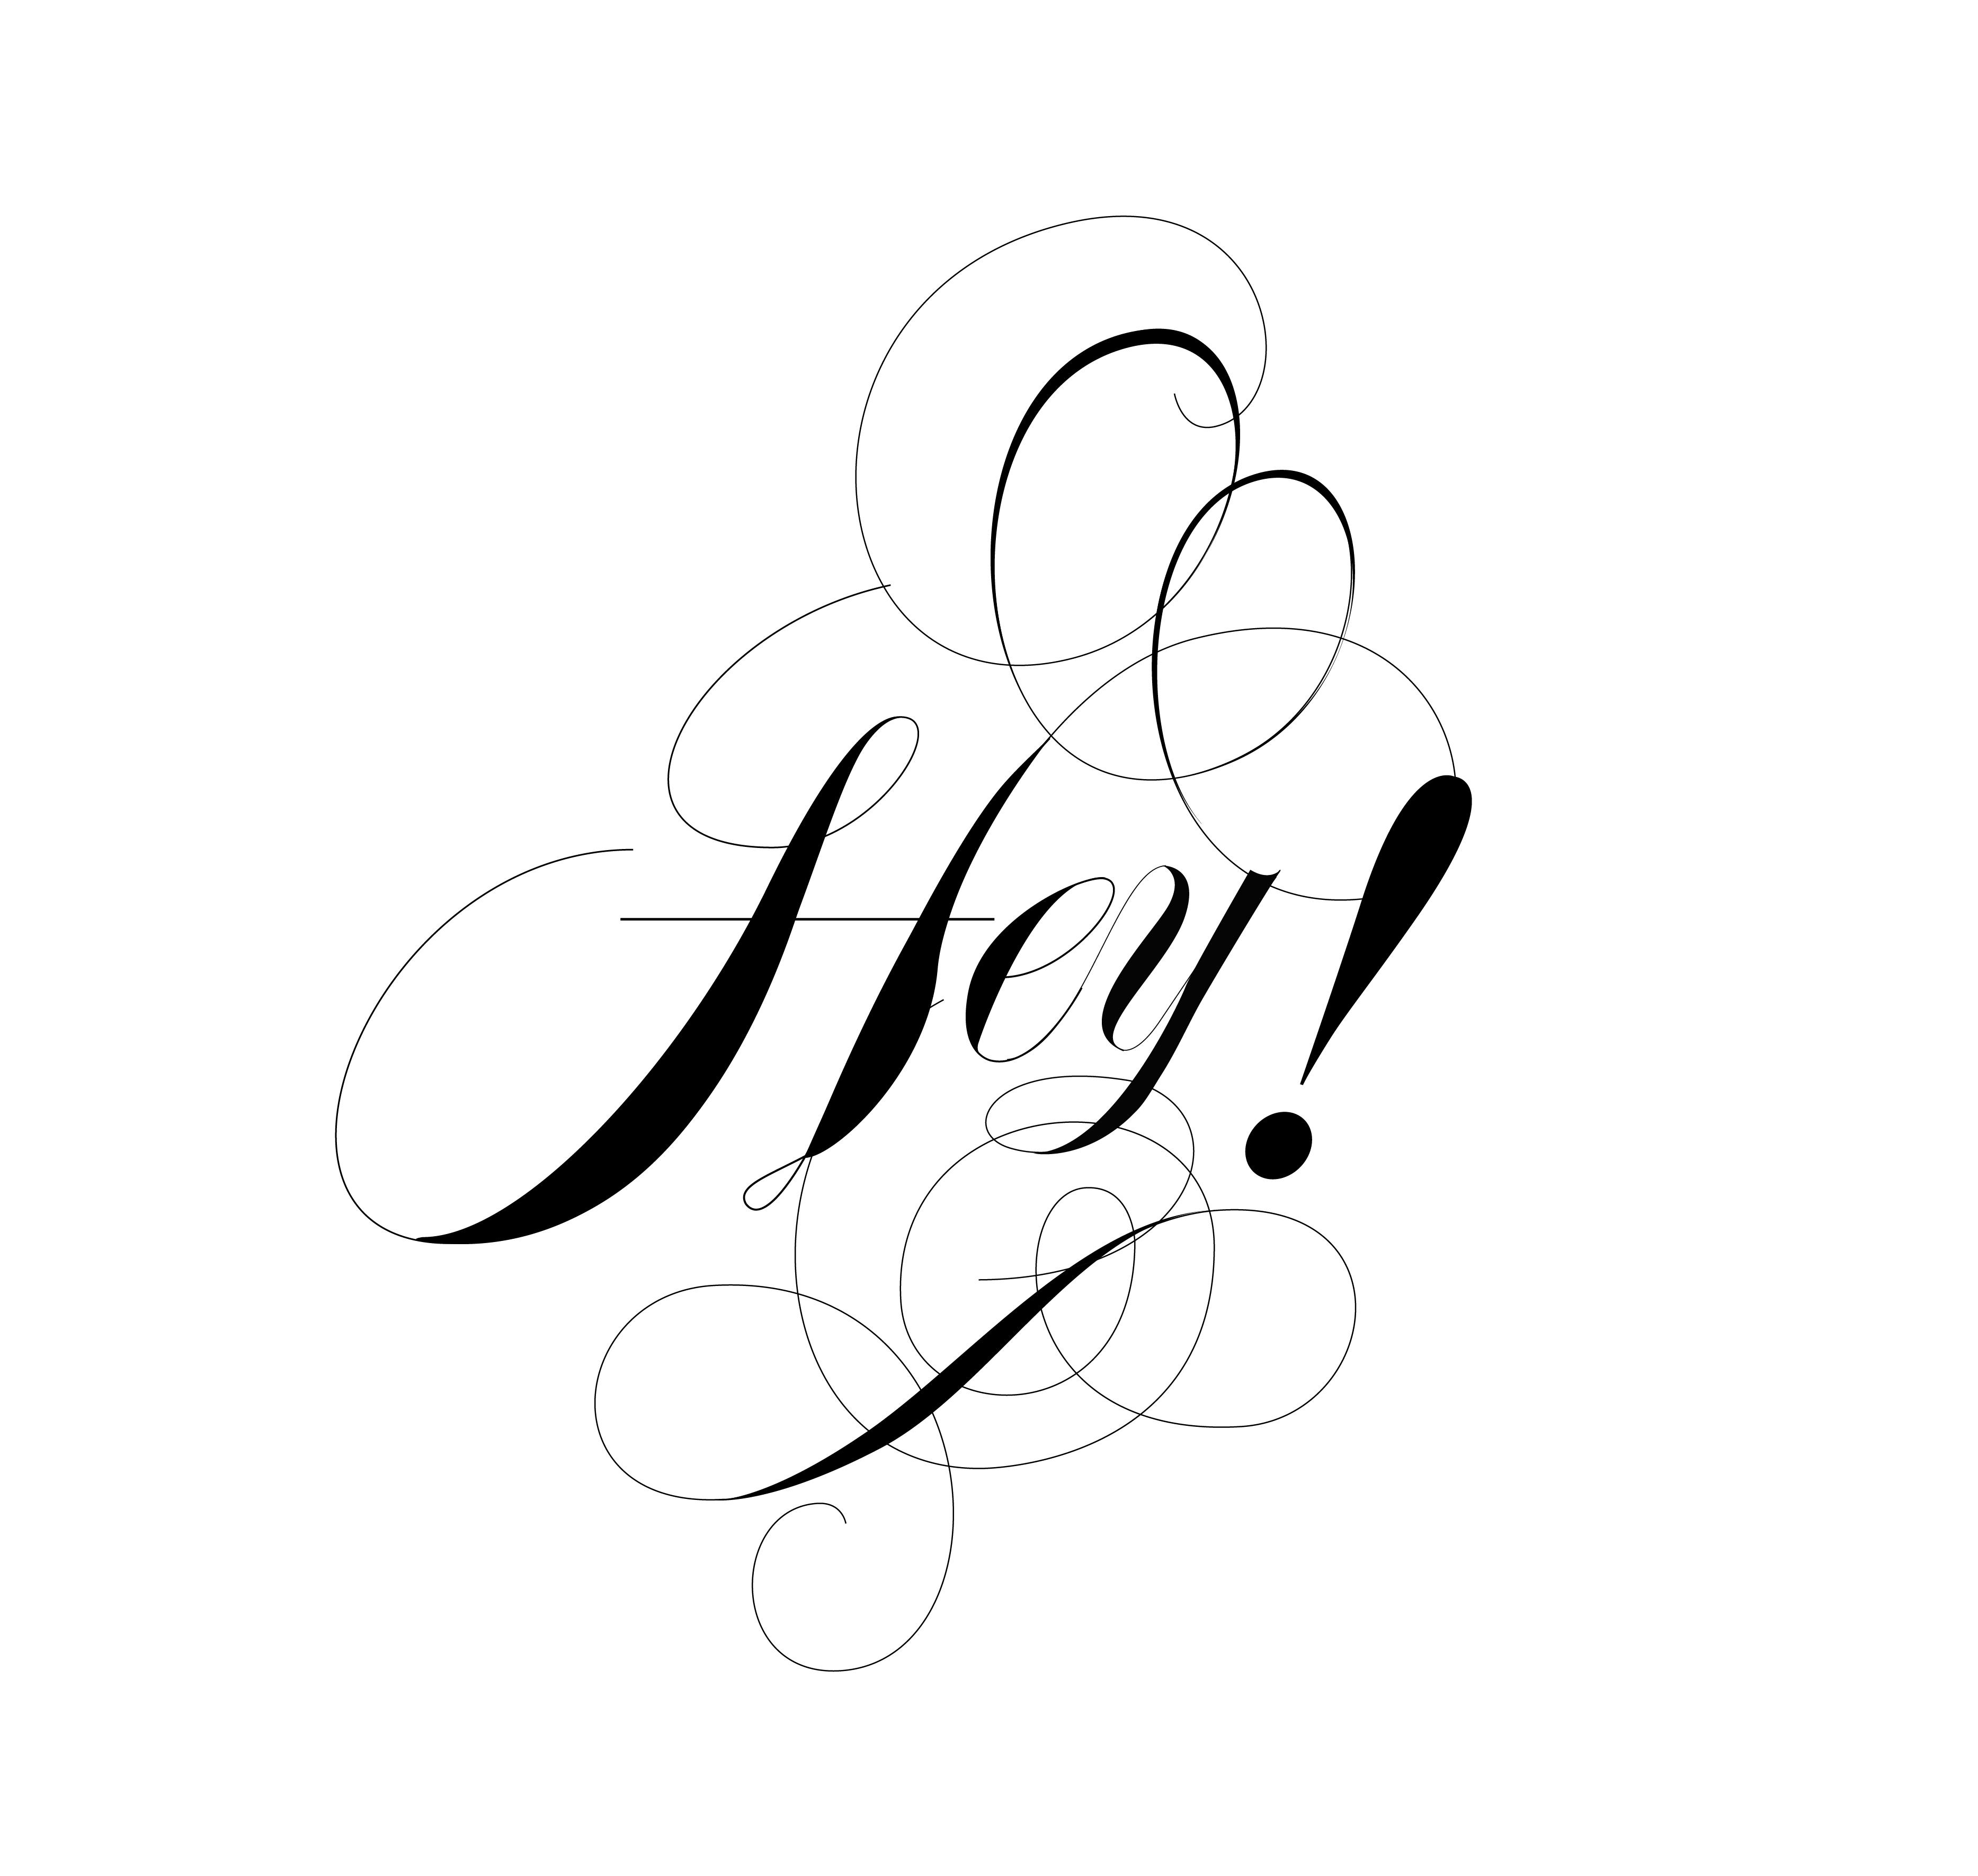 lettering-01